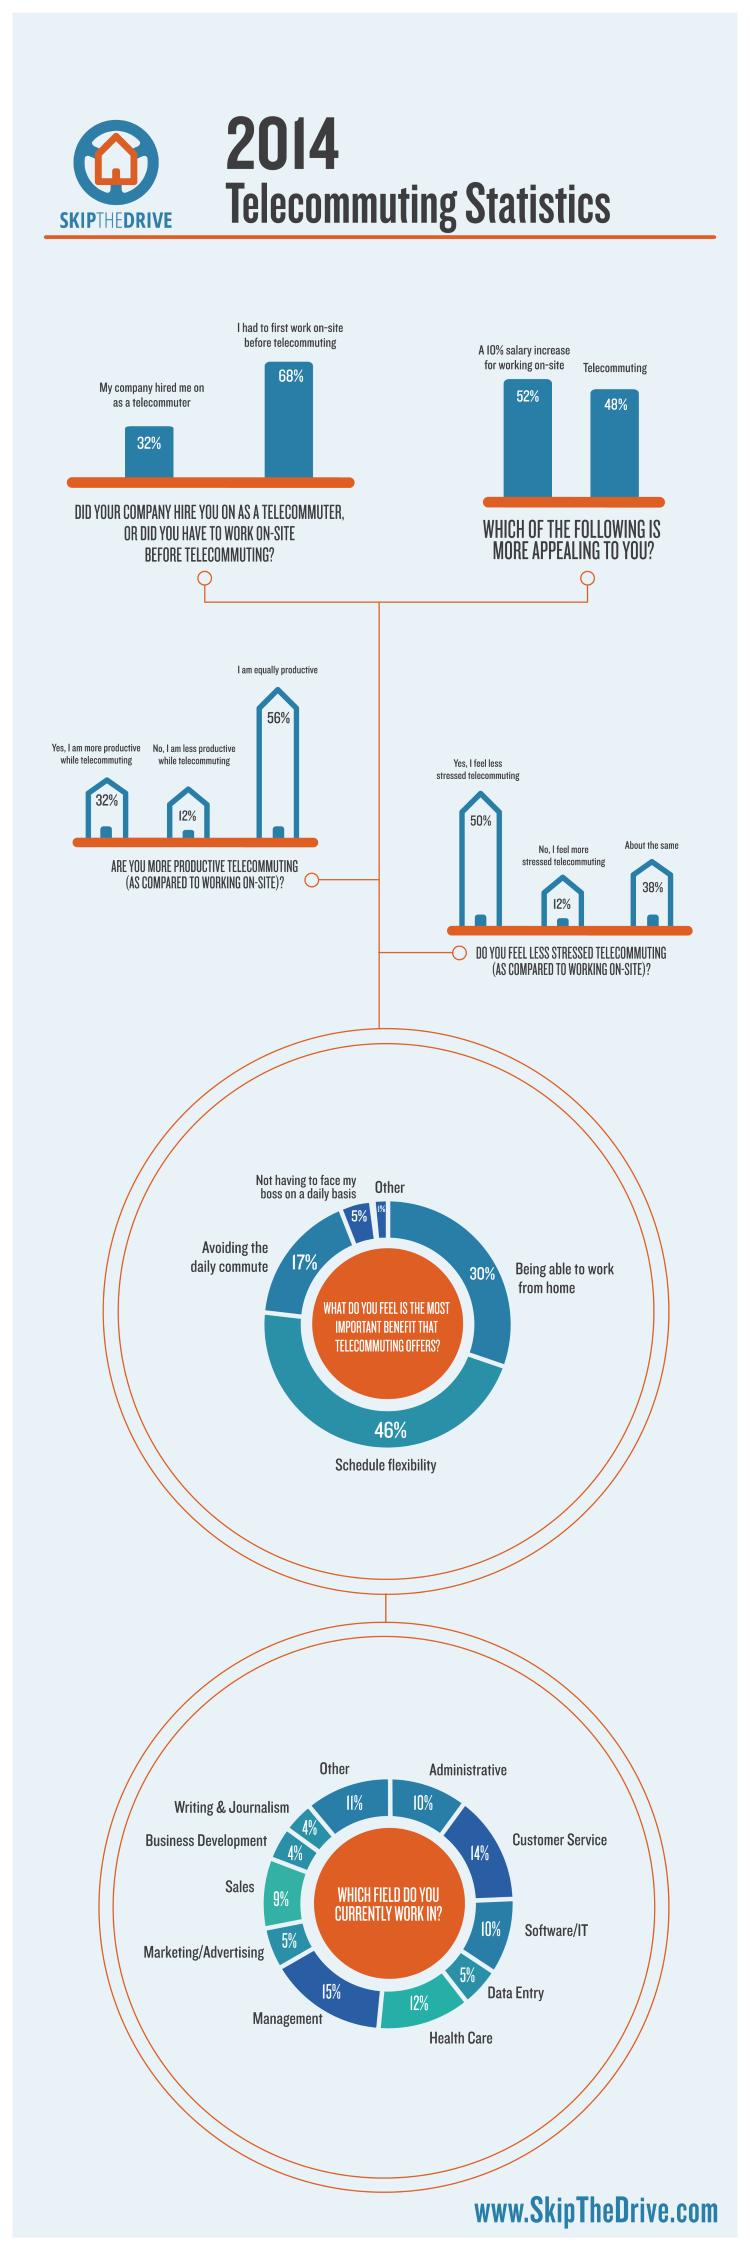 2014 telecommuting statistics infographic